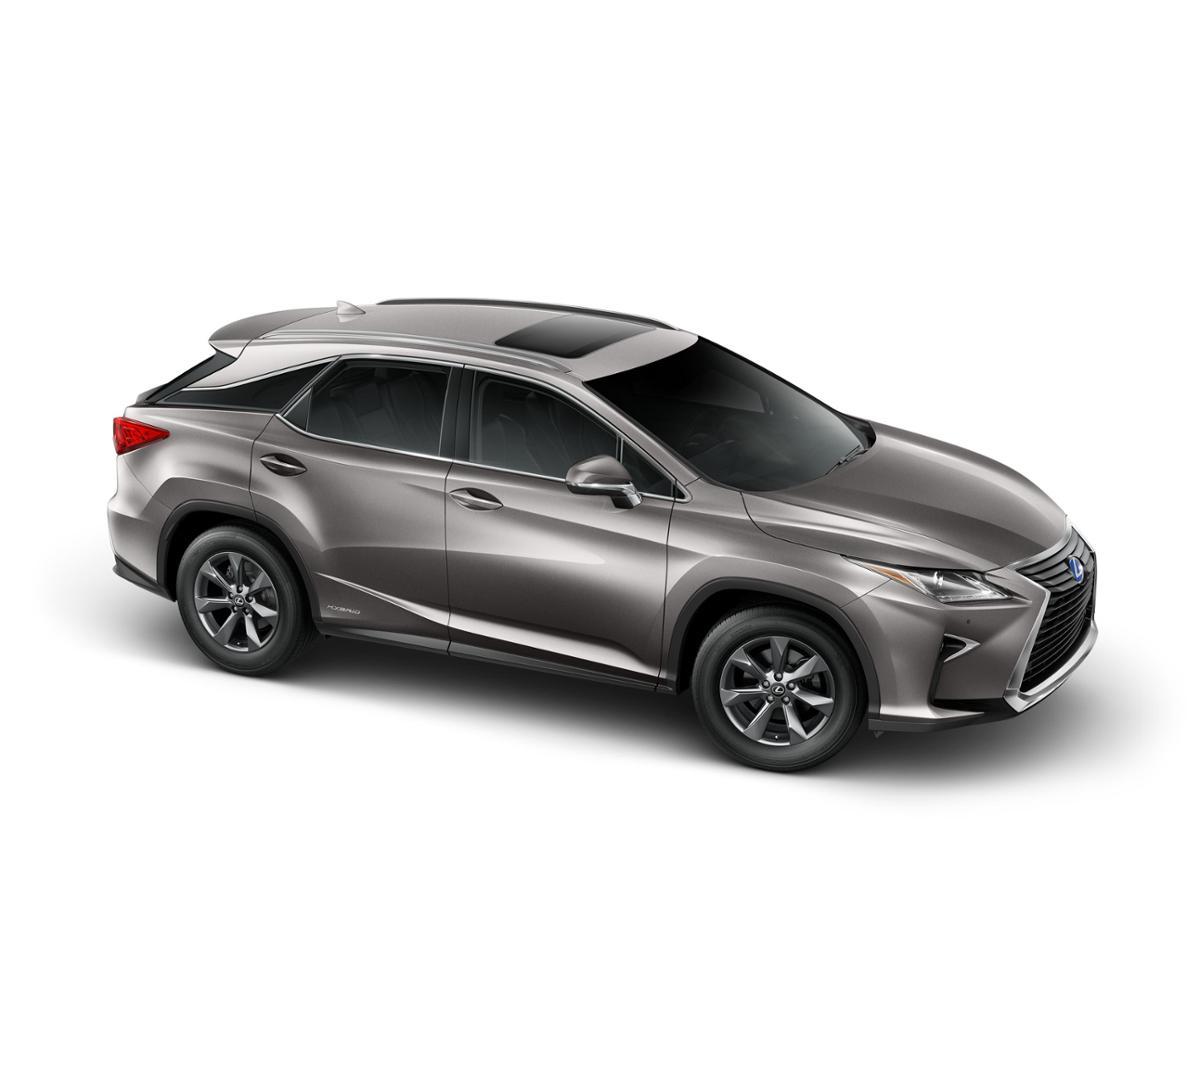 2019 Lexus Rx Hybrid: 2019 Lexus RX 450h For Sale Near Los Angeles